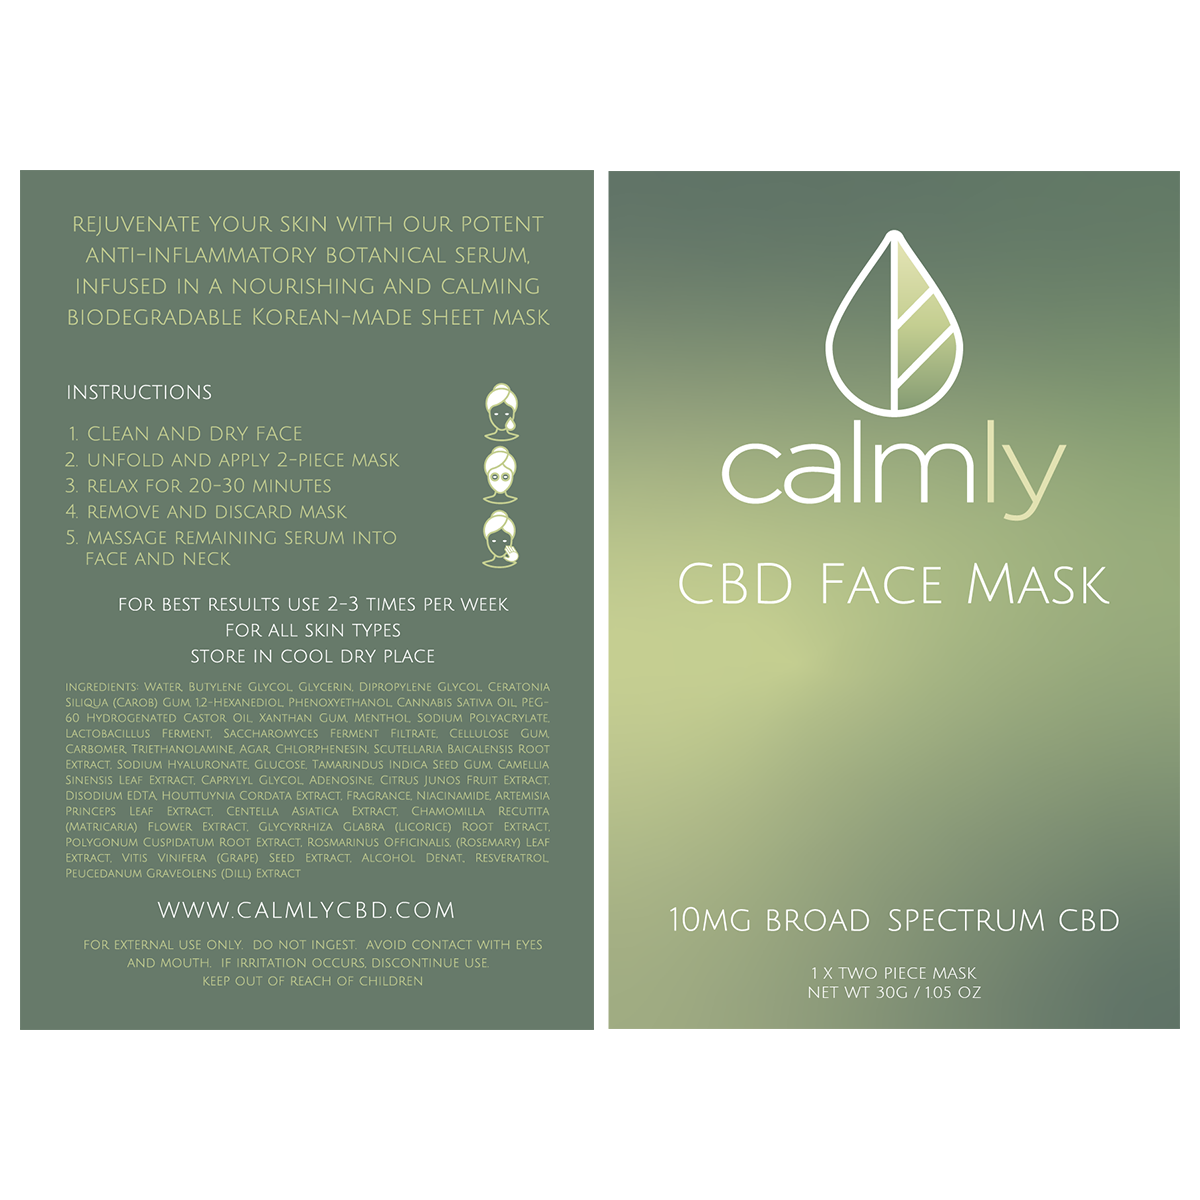 10mg CBD Facer Mask